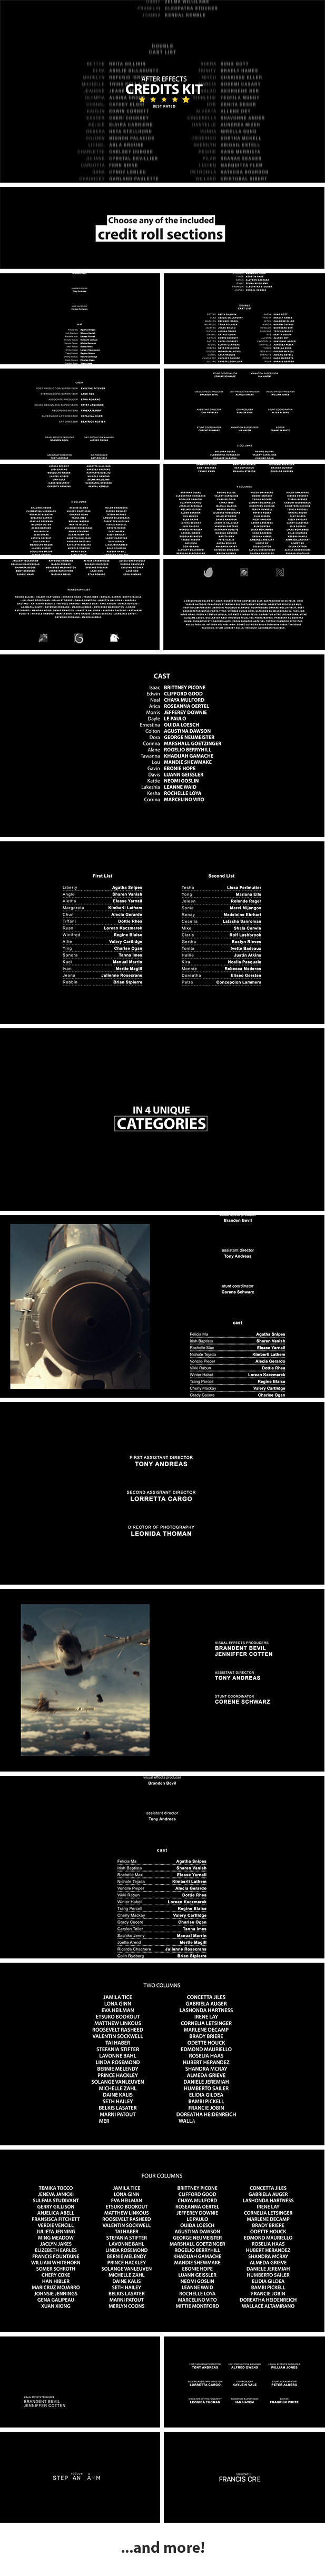 Cinema Film Credits Pack - 13